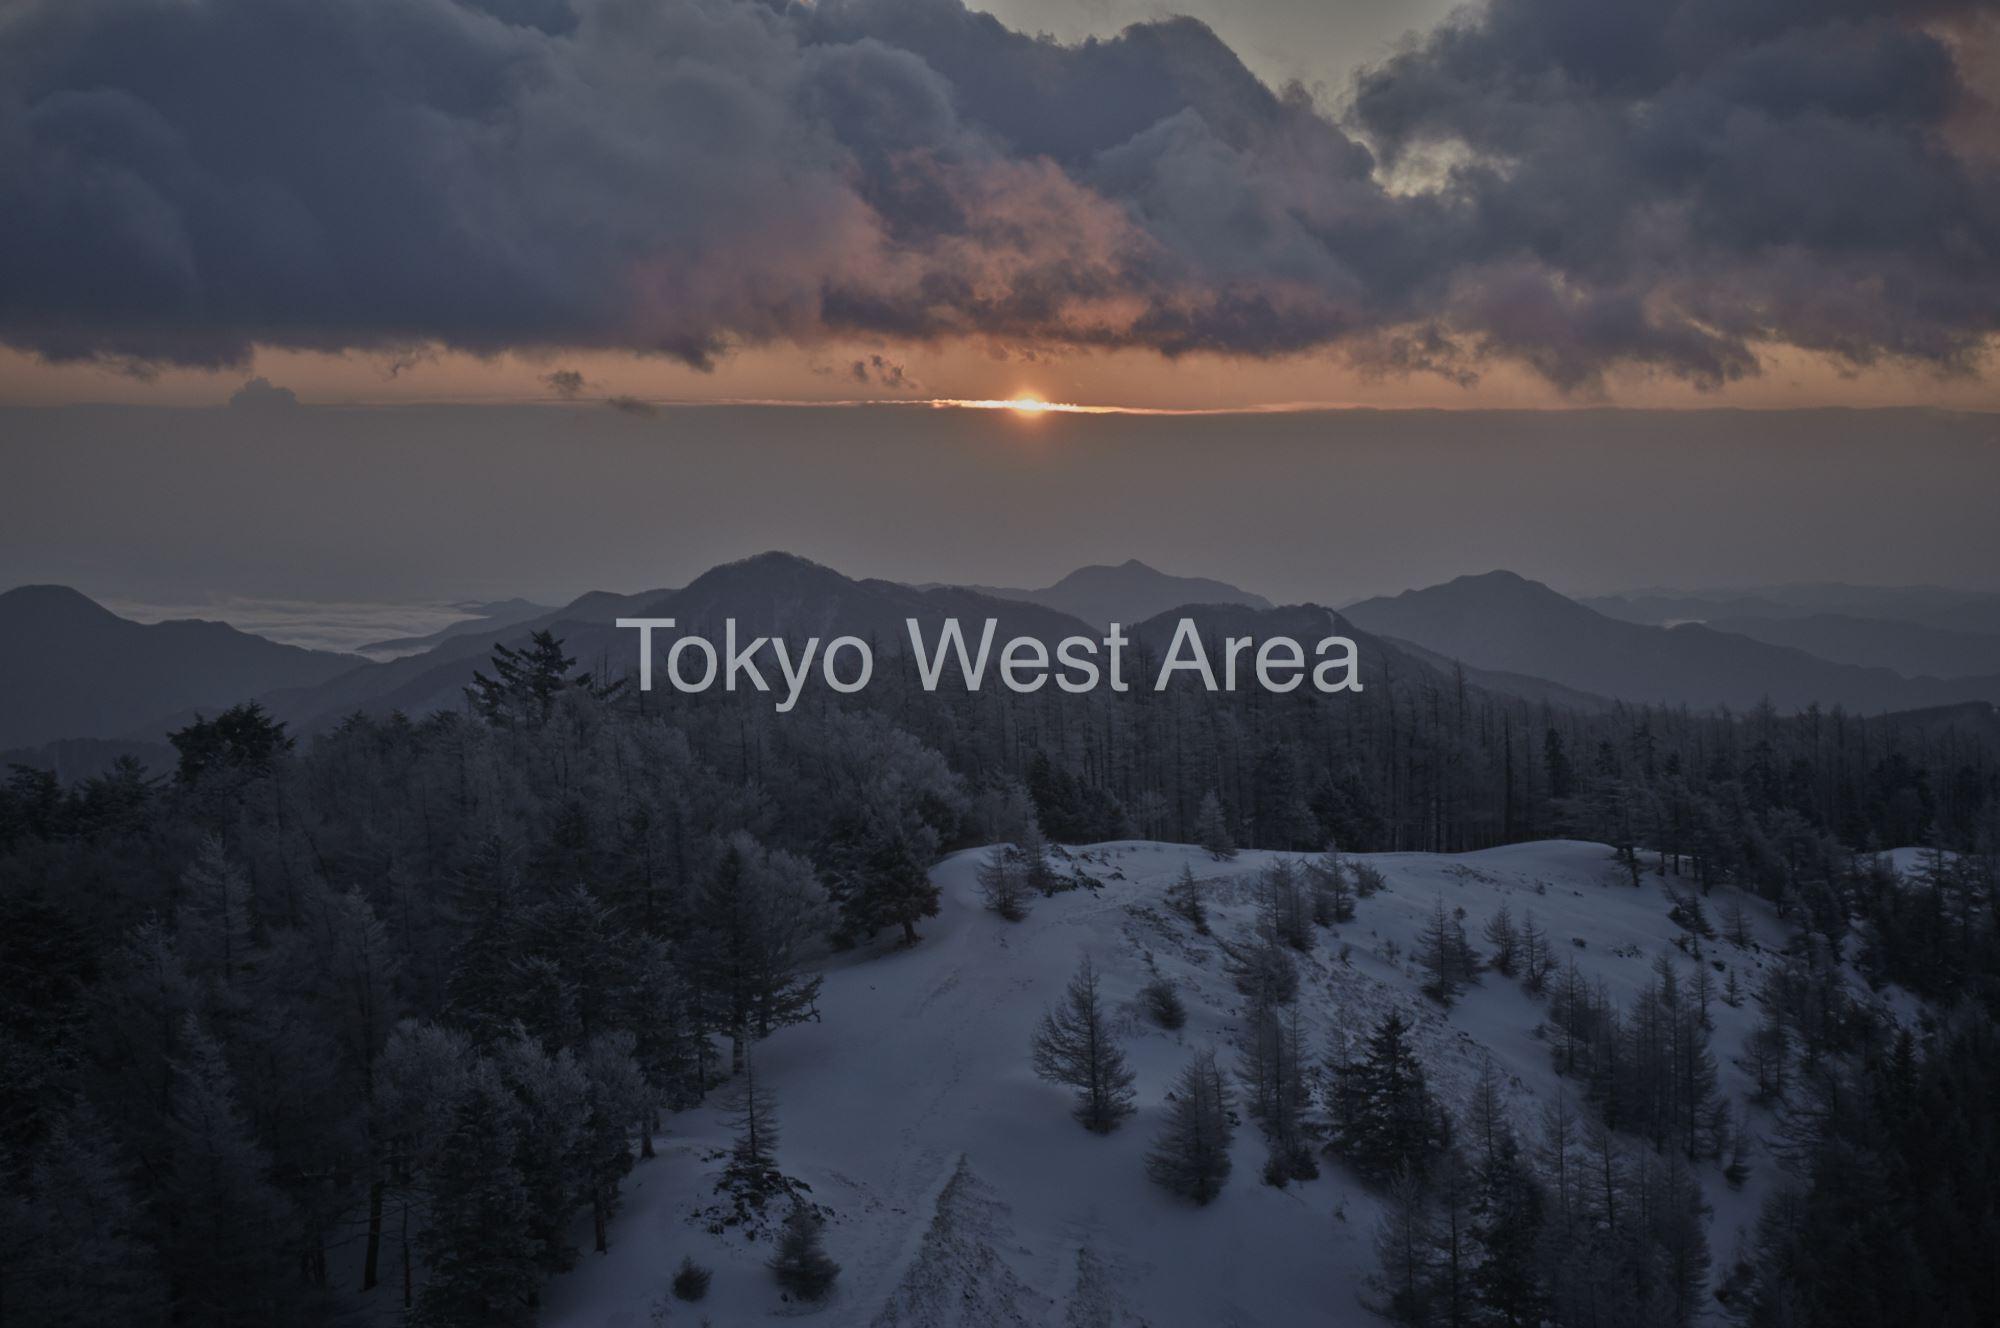 shigekazukida 貴田茂和 奥多摩 雲取山